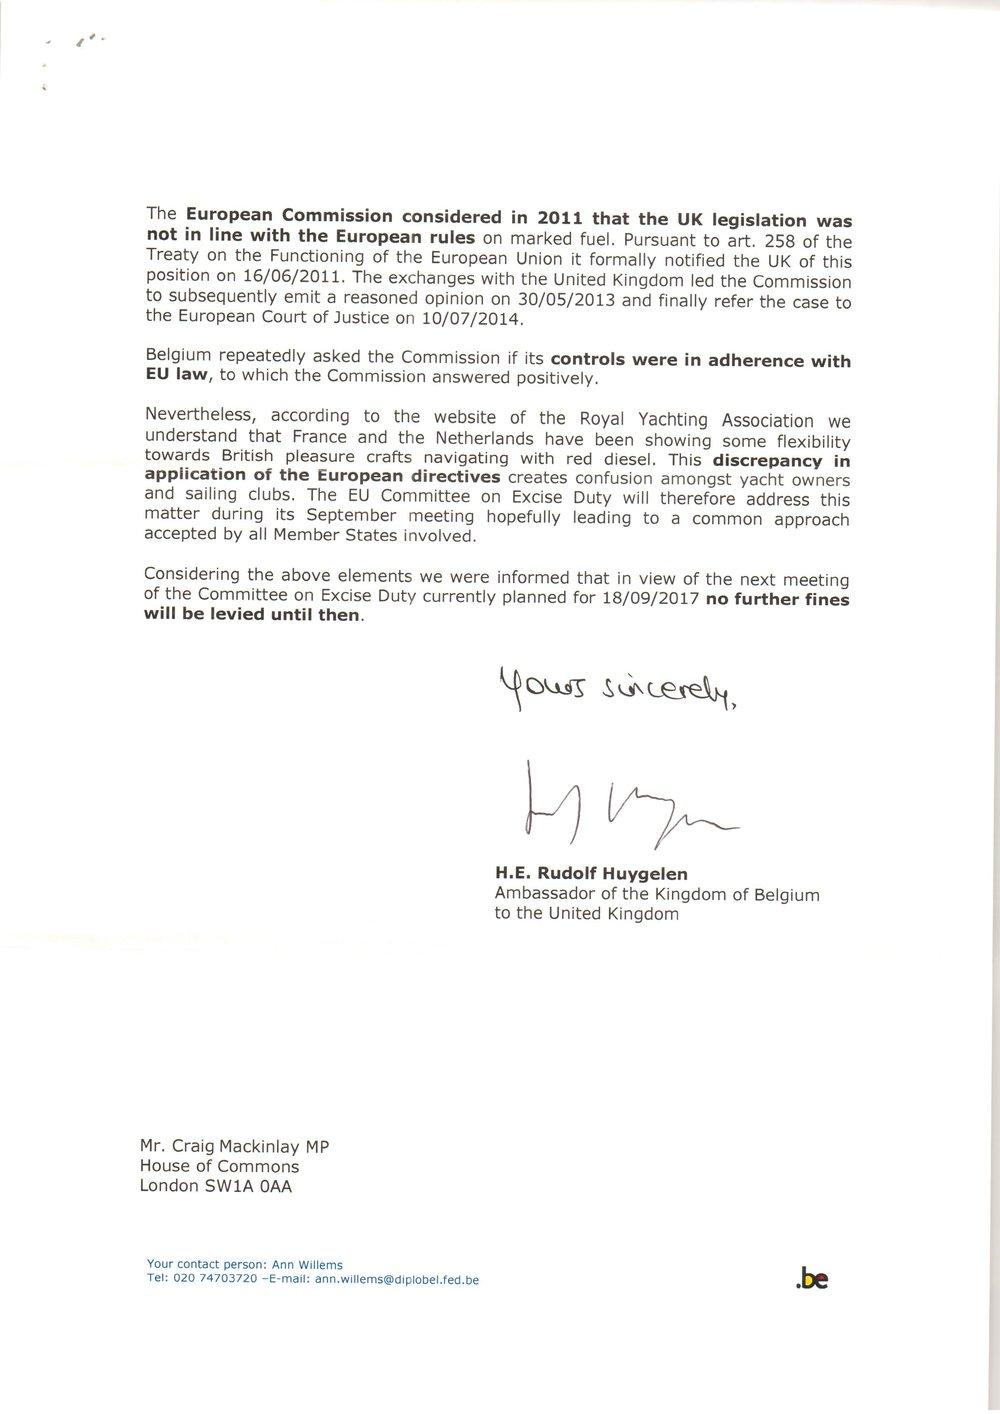 Belgian Ambassador's reply of 27 July17 Part 2.jpg